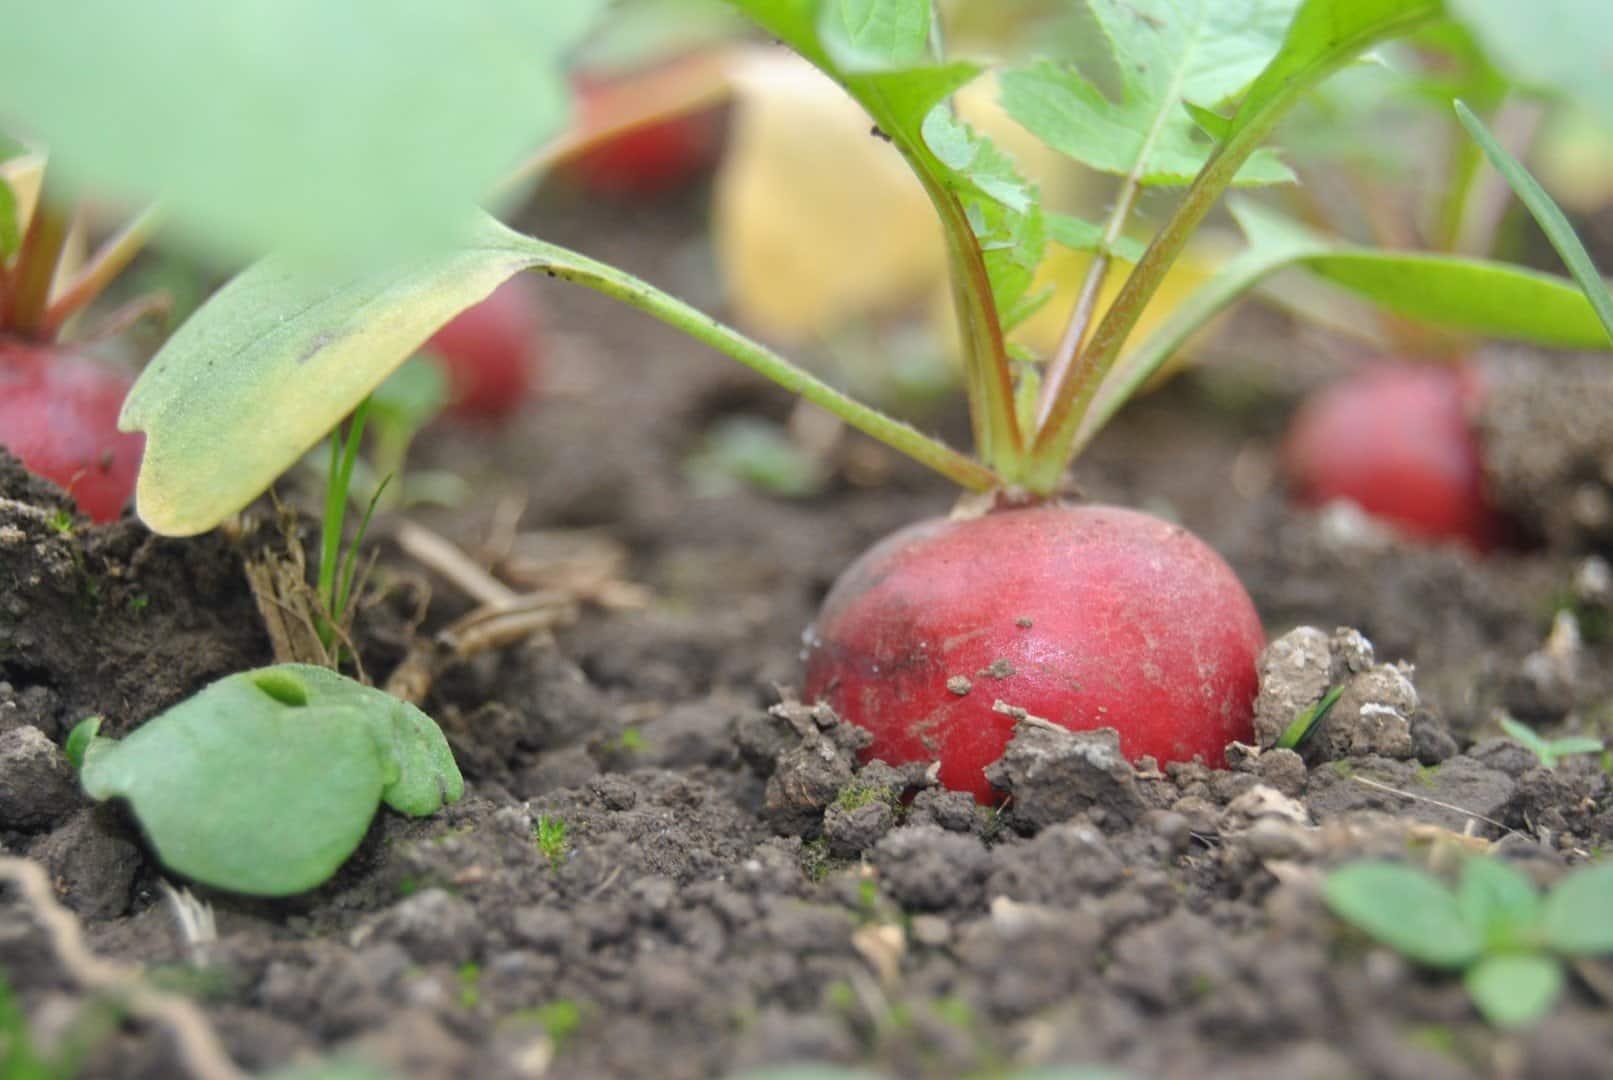 Agricoltura biologica in fattoria